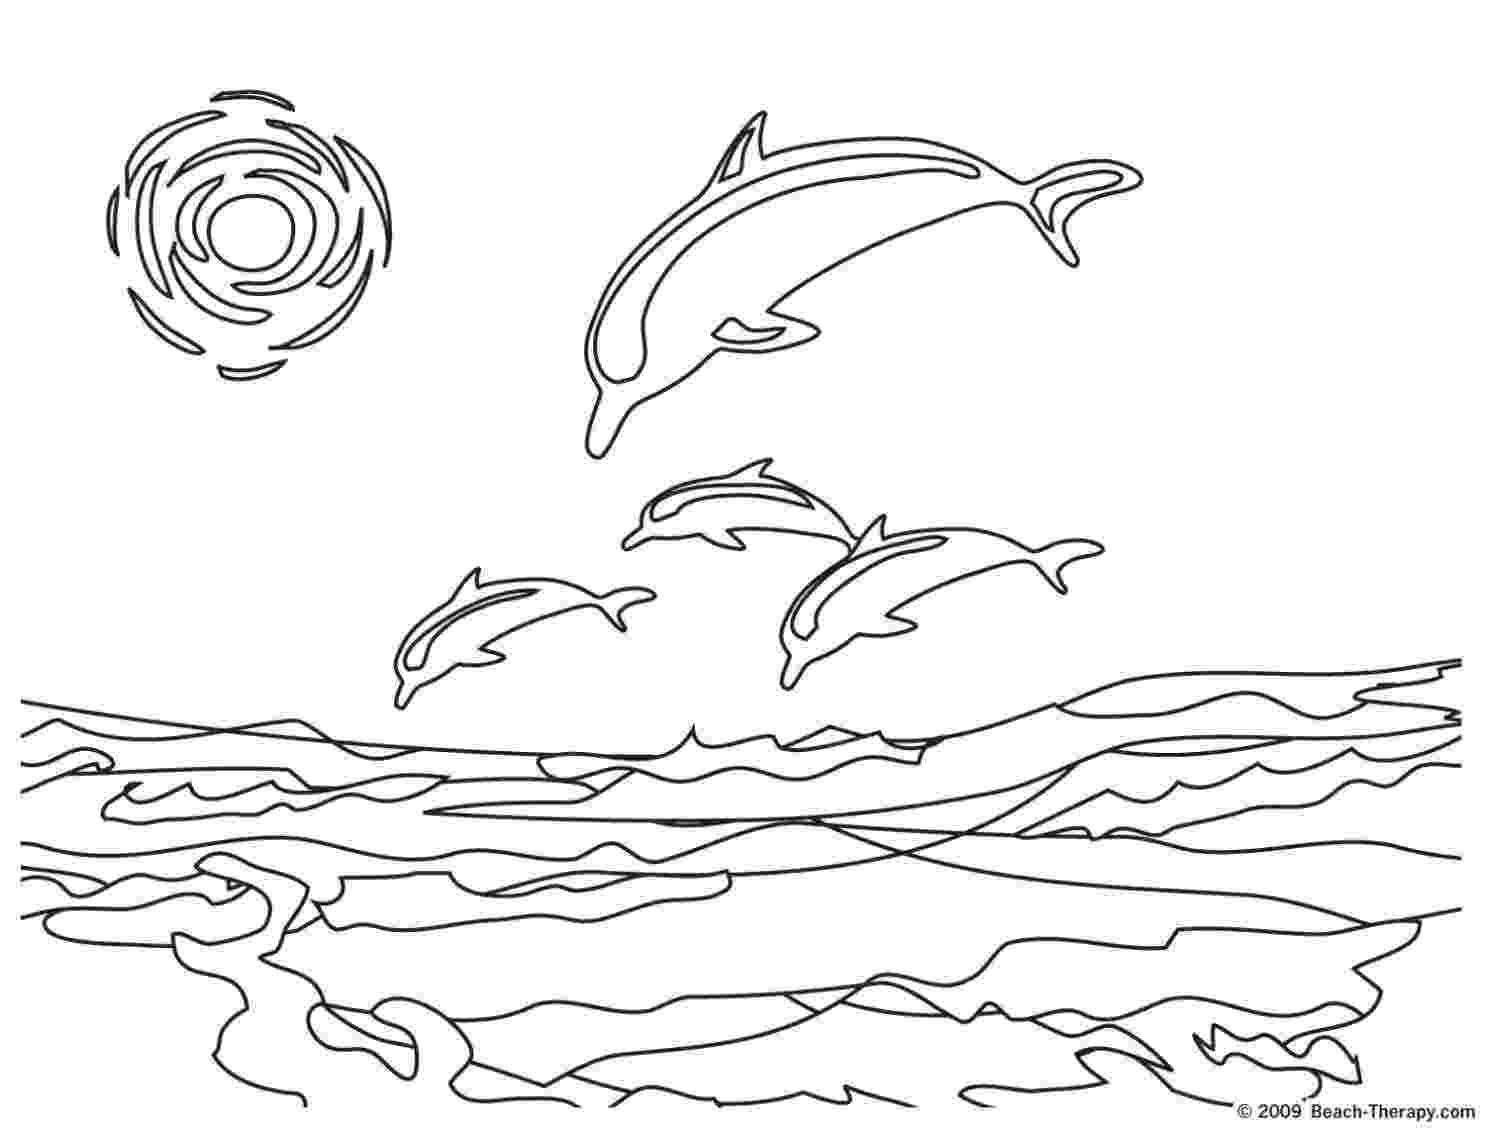 coloring pages beach scenes beach scene coloring pages getcoloringpagescom pages coloring scenes beach